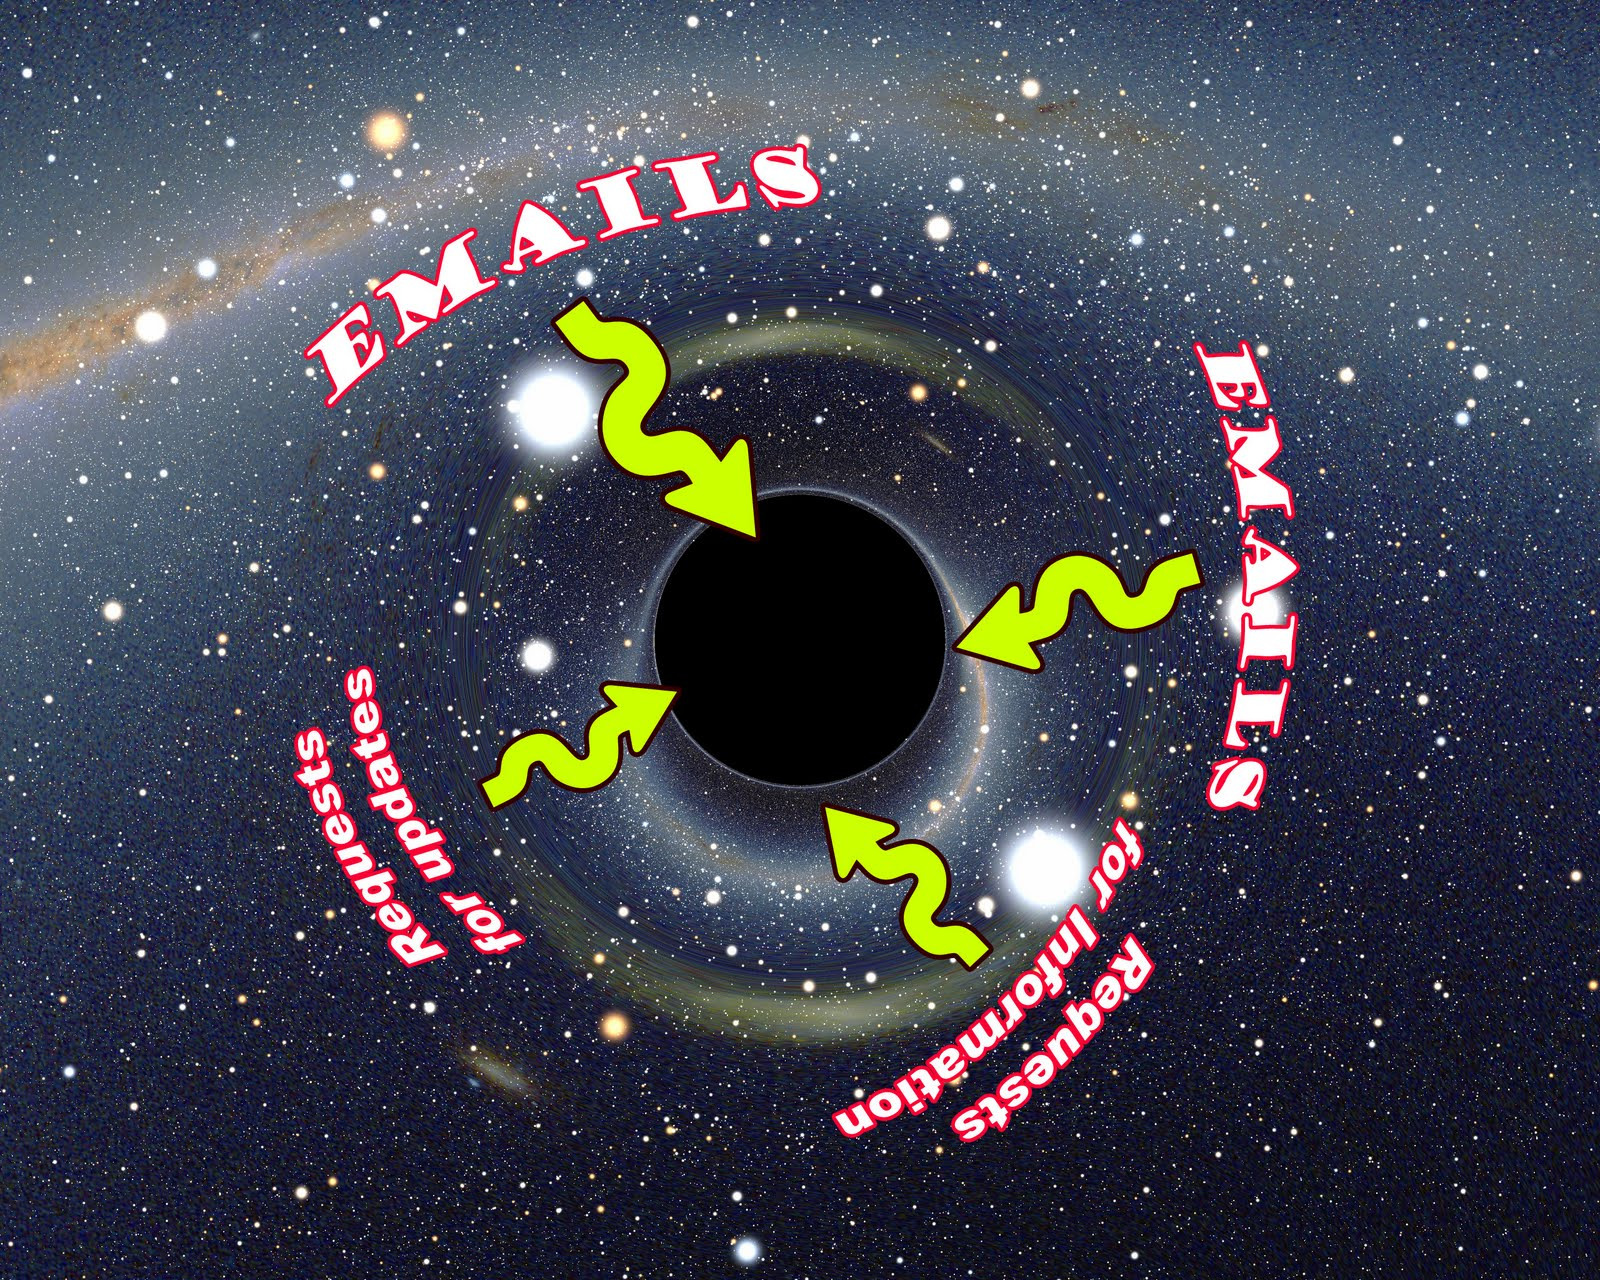 event horizon black hole interstellar - photo #19